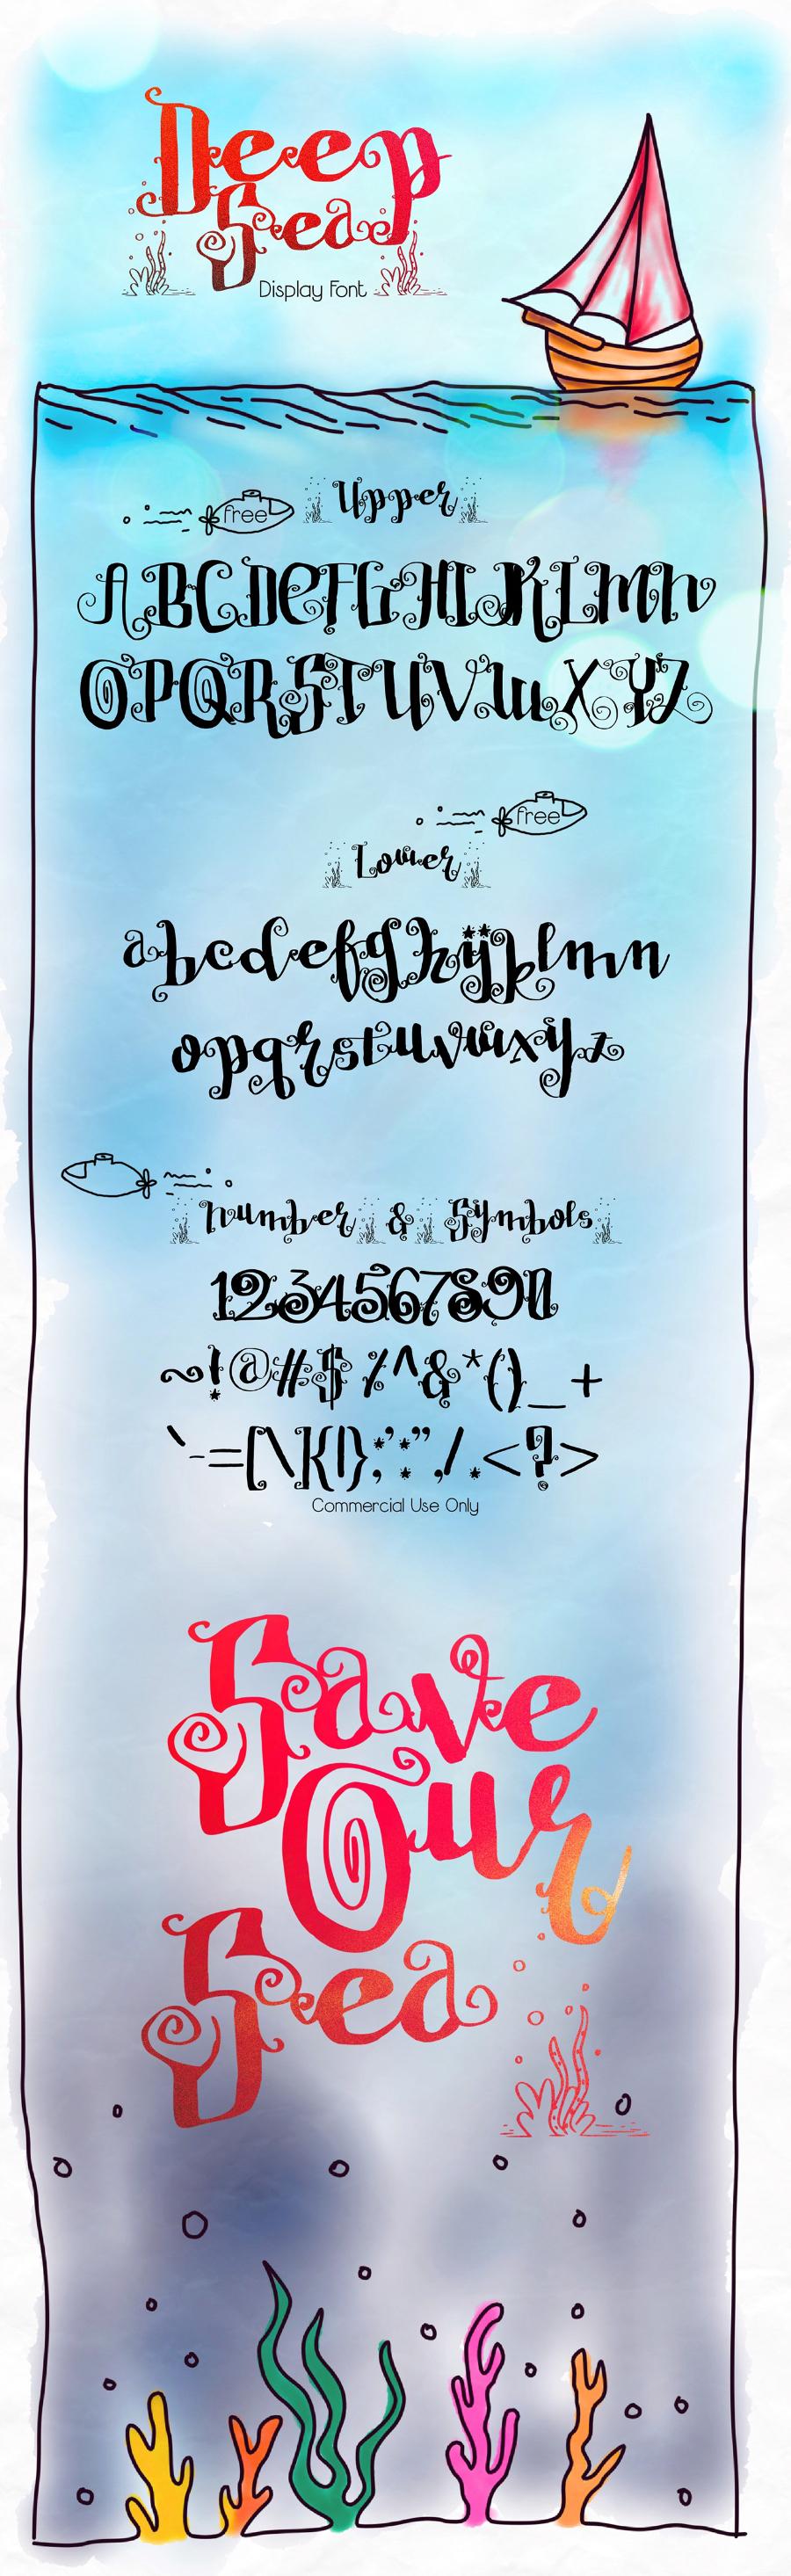 Deep Sea Free Display Font